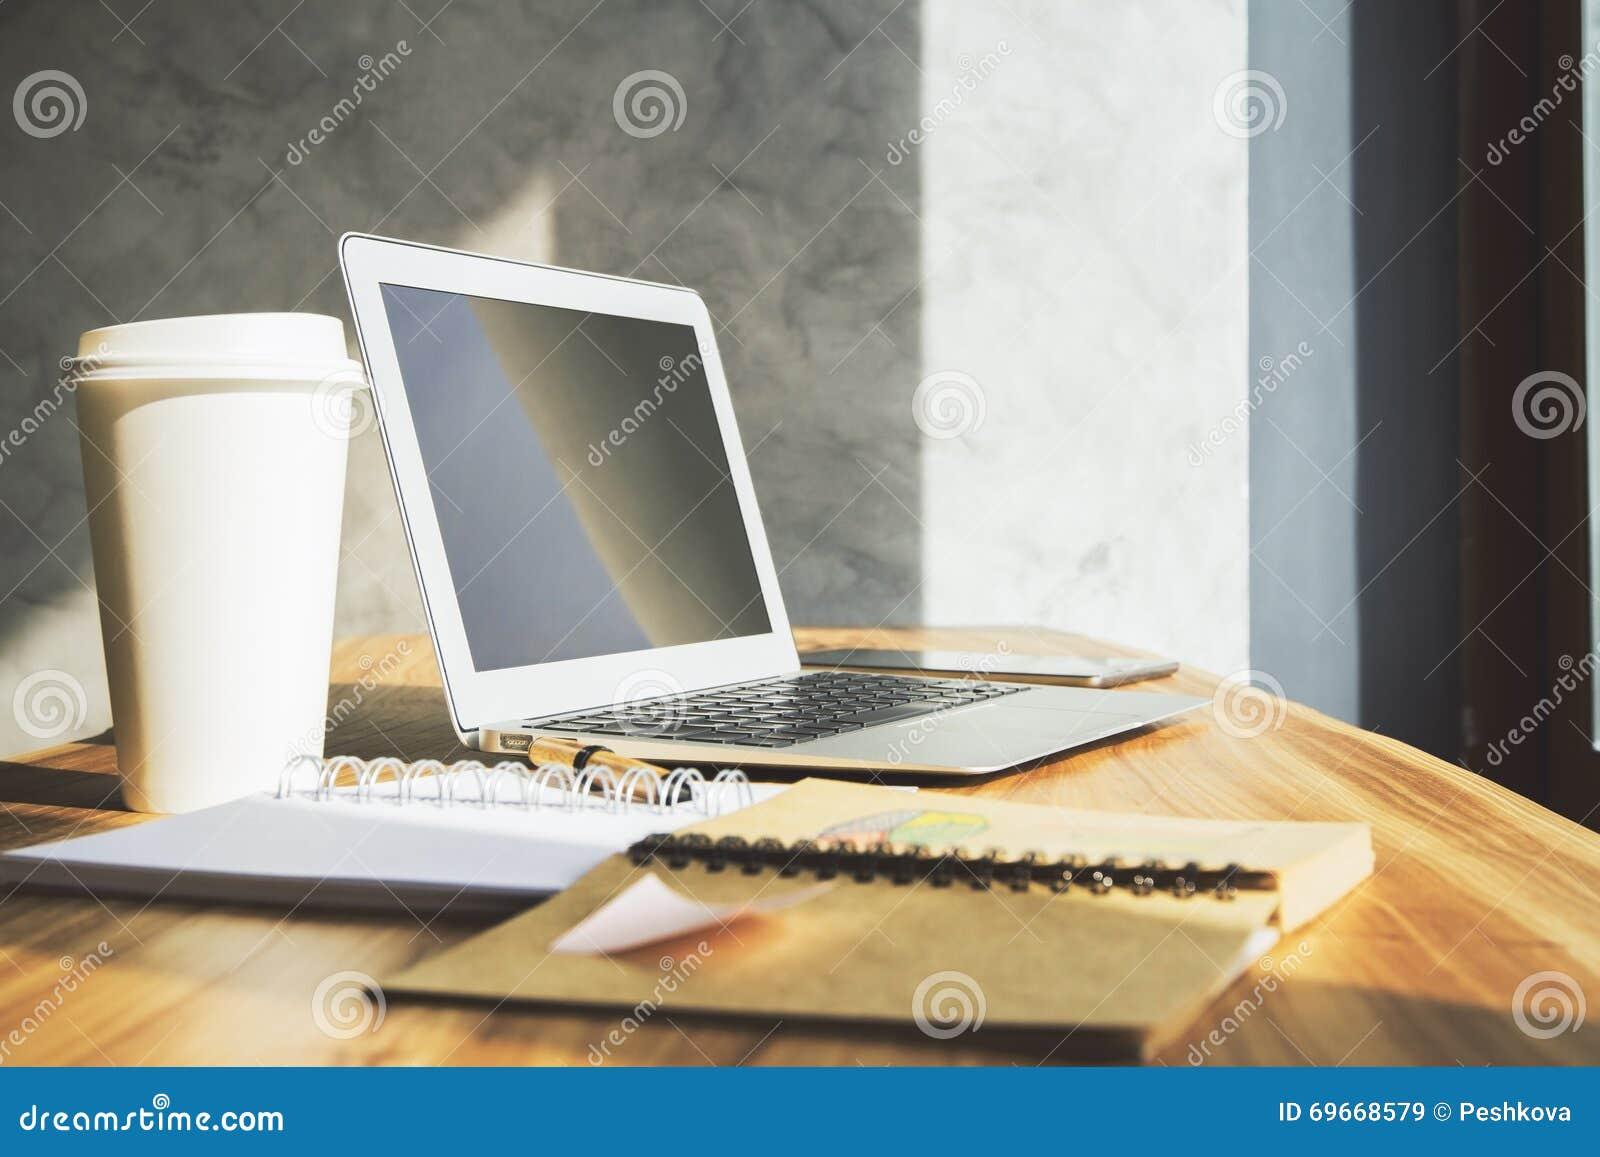 Office Desktop With Laptop Stock Image Image Of Desktop 69668579